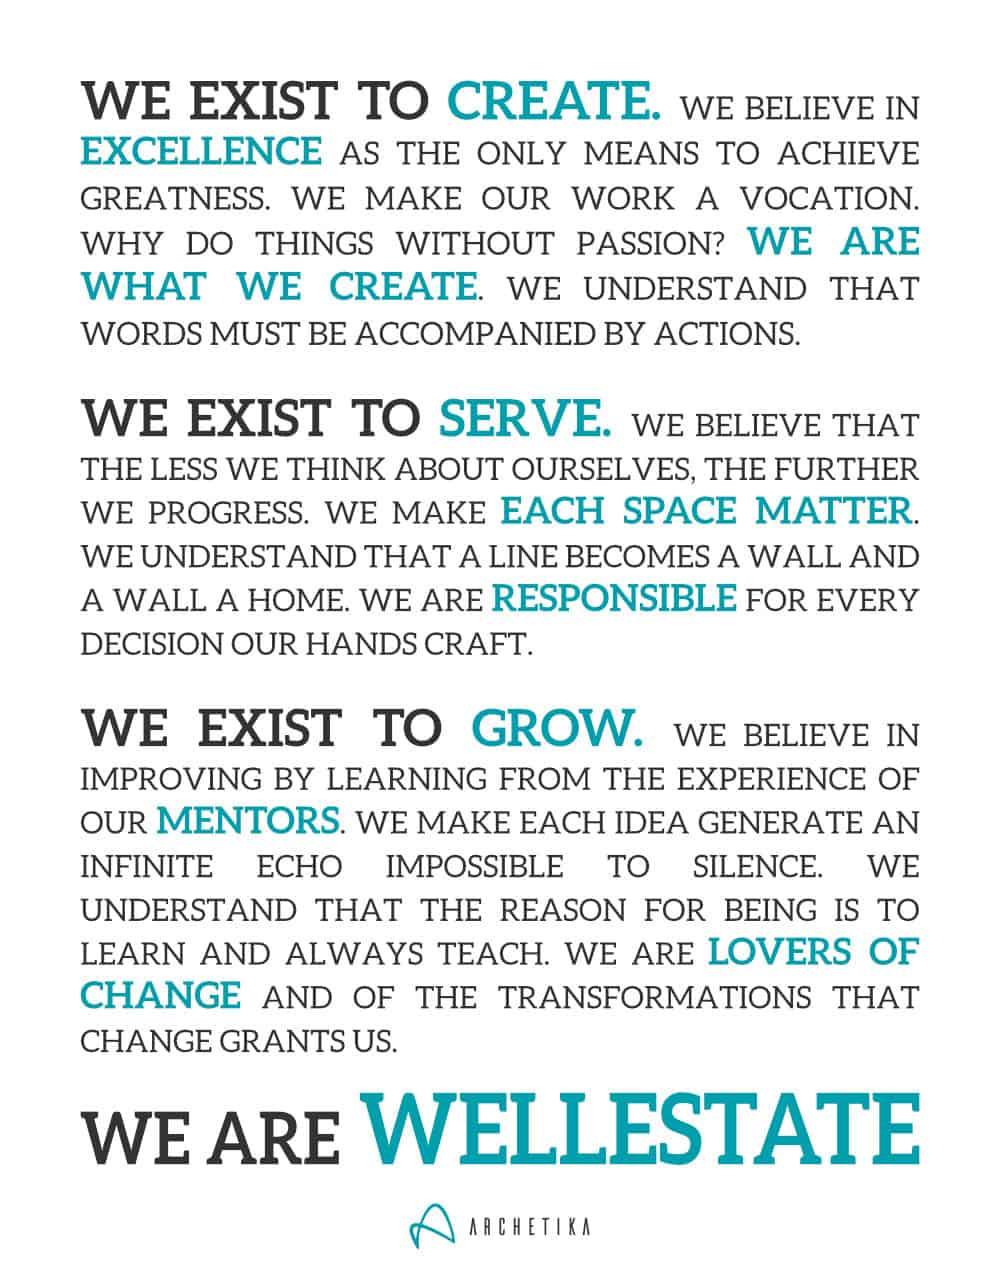 The Wellestate Manifesto: Building Wellness Real Estate Developments - Archetika